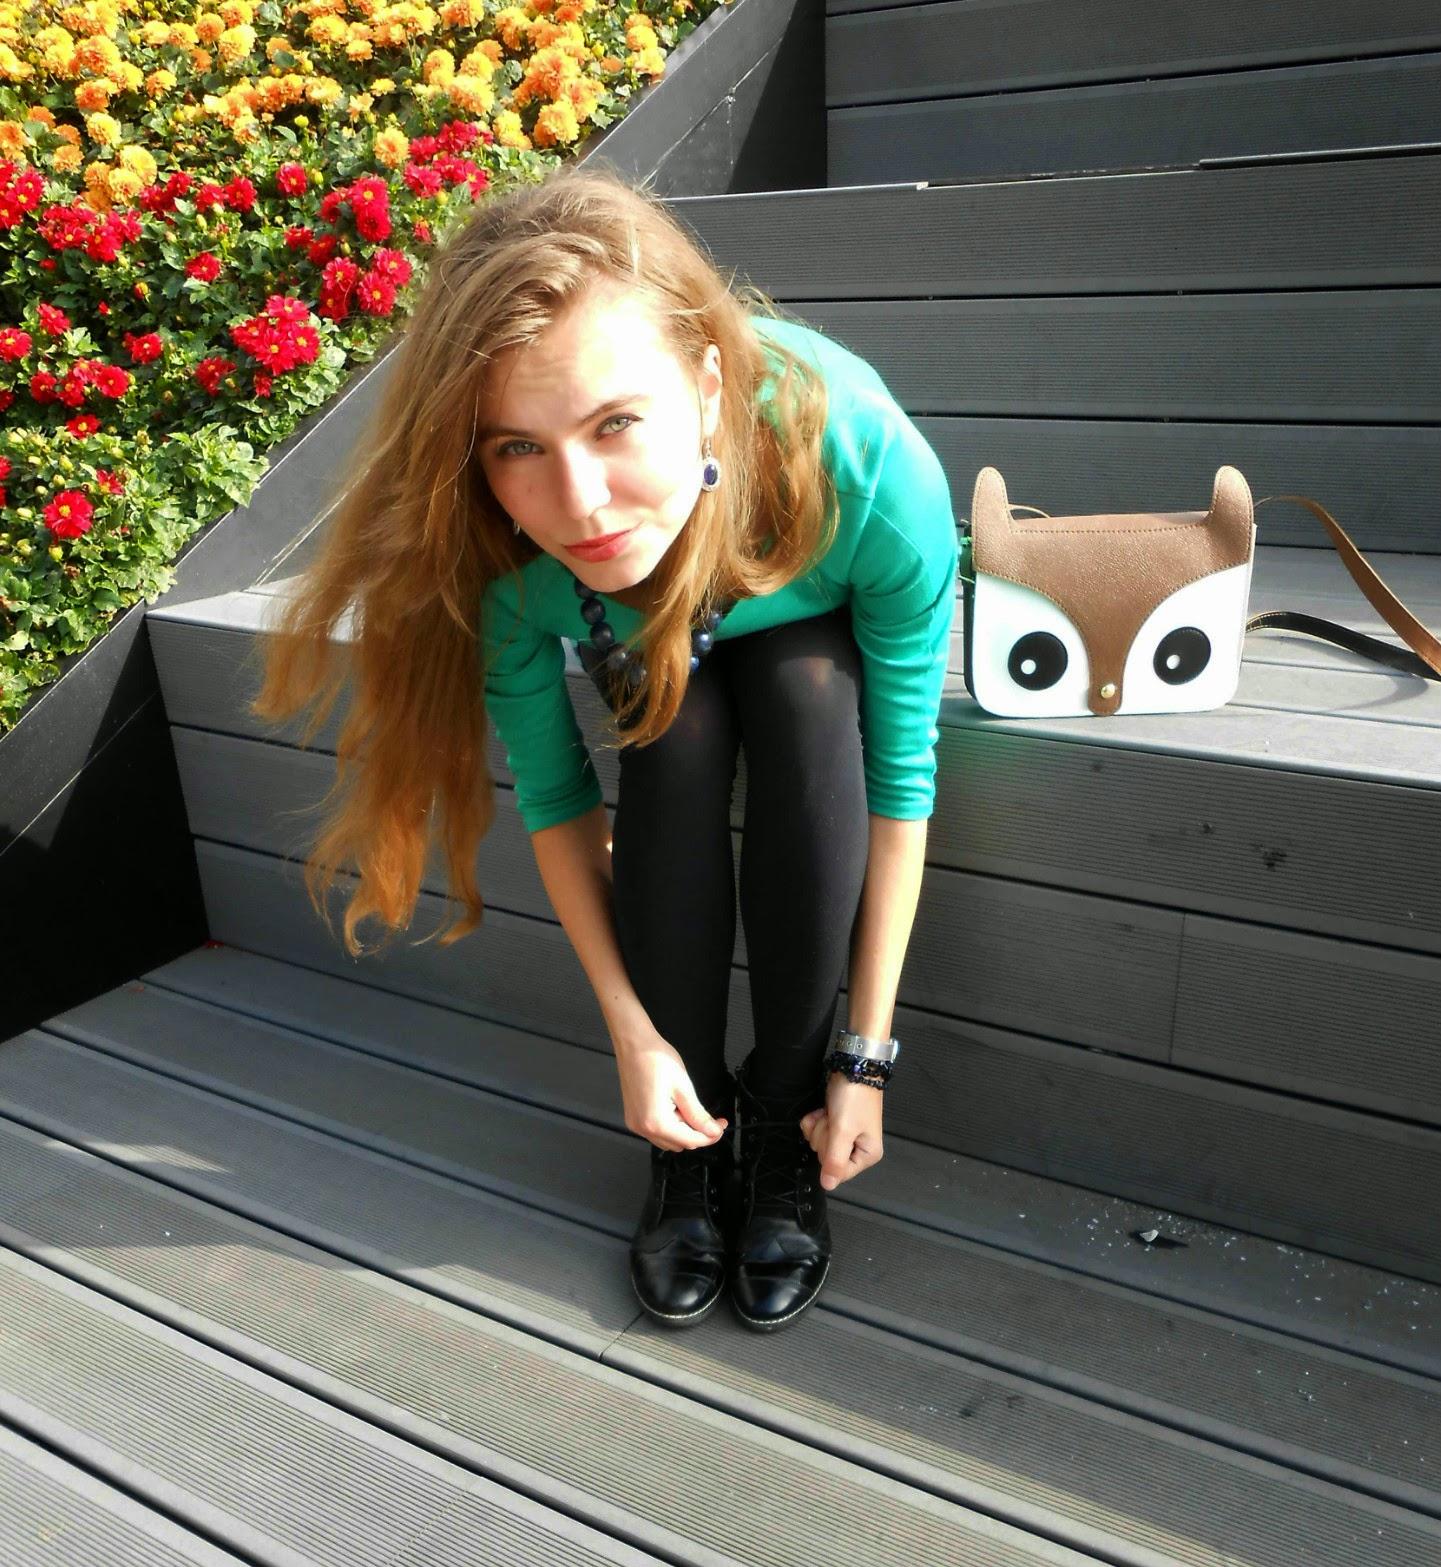 owl beg. aliexpress. rewiev